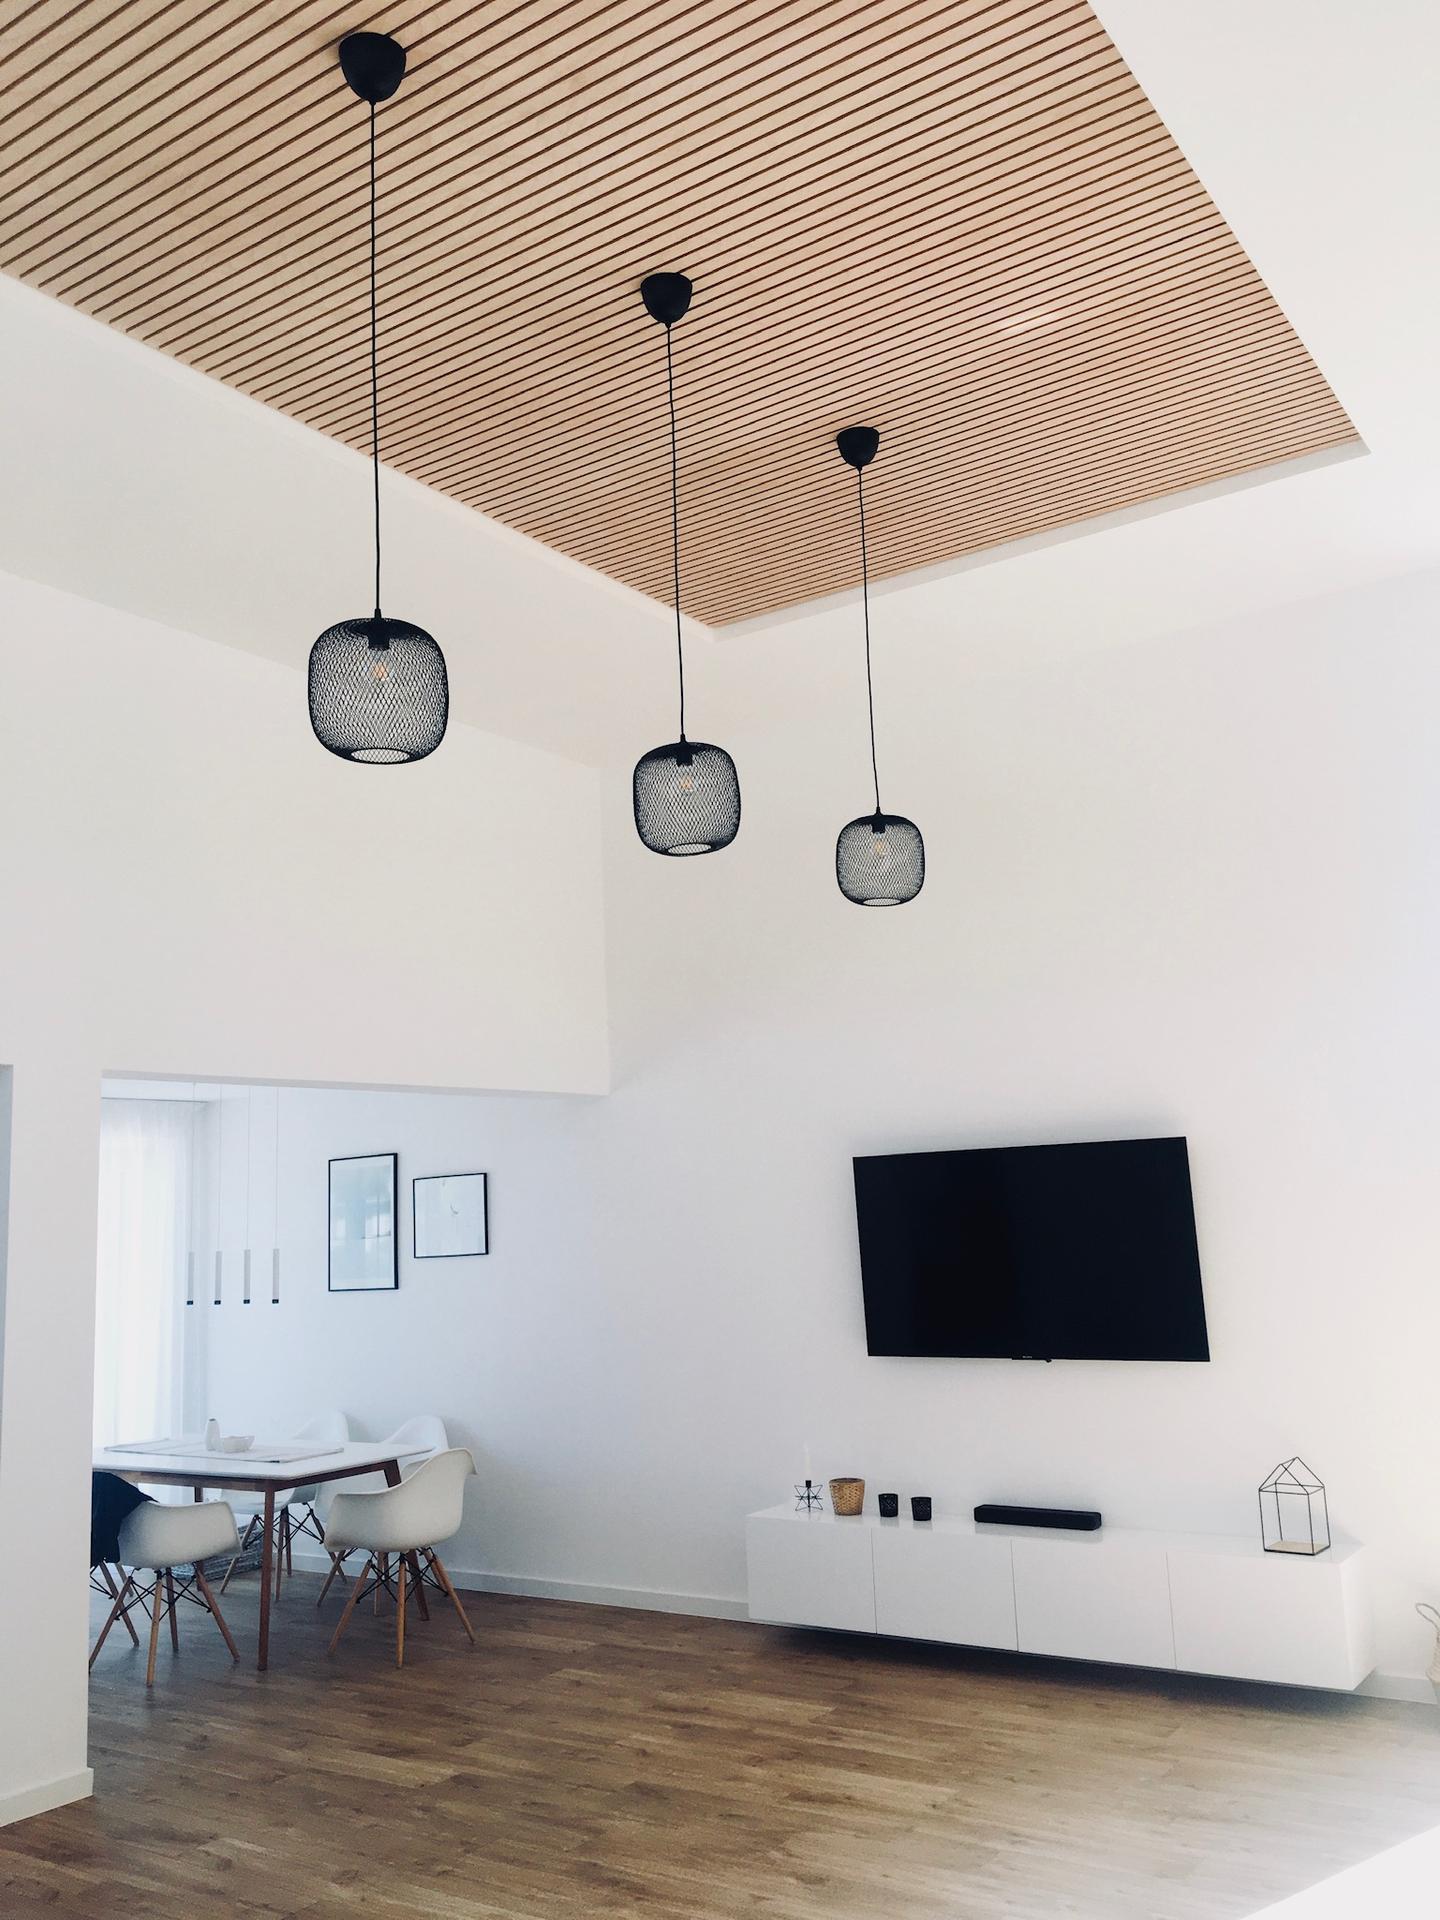 Lamelový panel prevedenie natur / transparent - vysoký strop, prevdenie natur lamelový panel